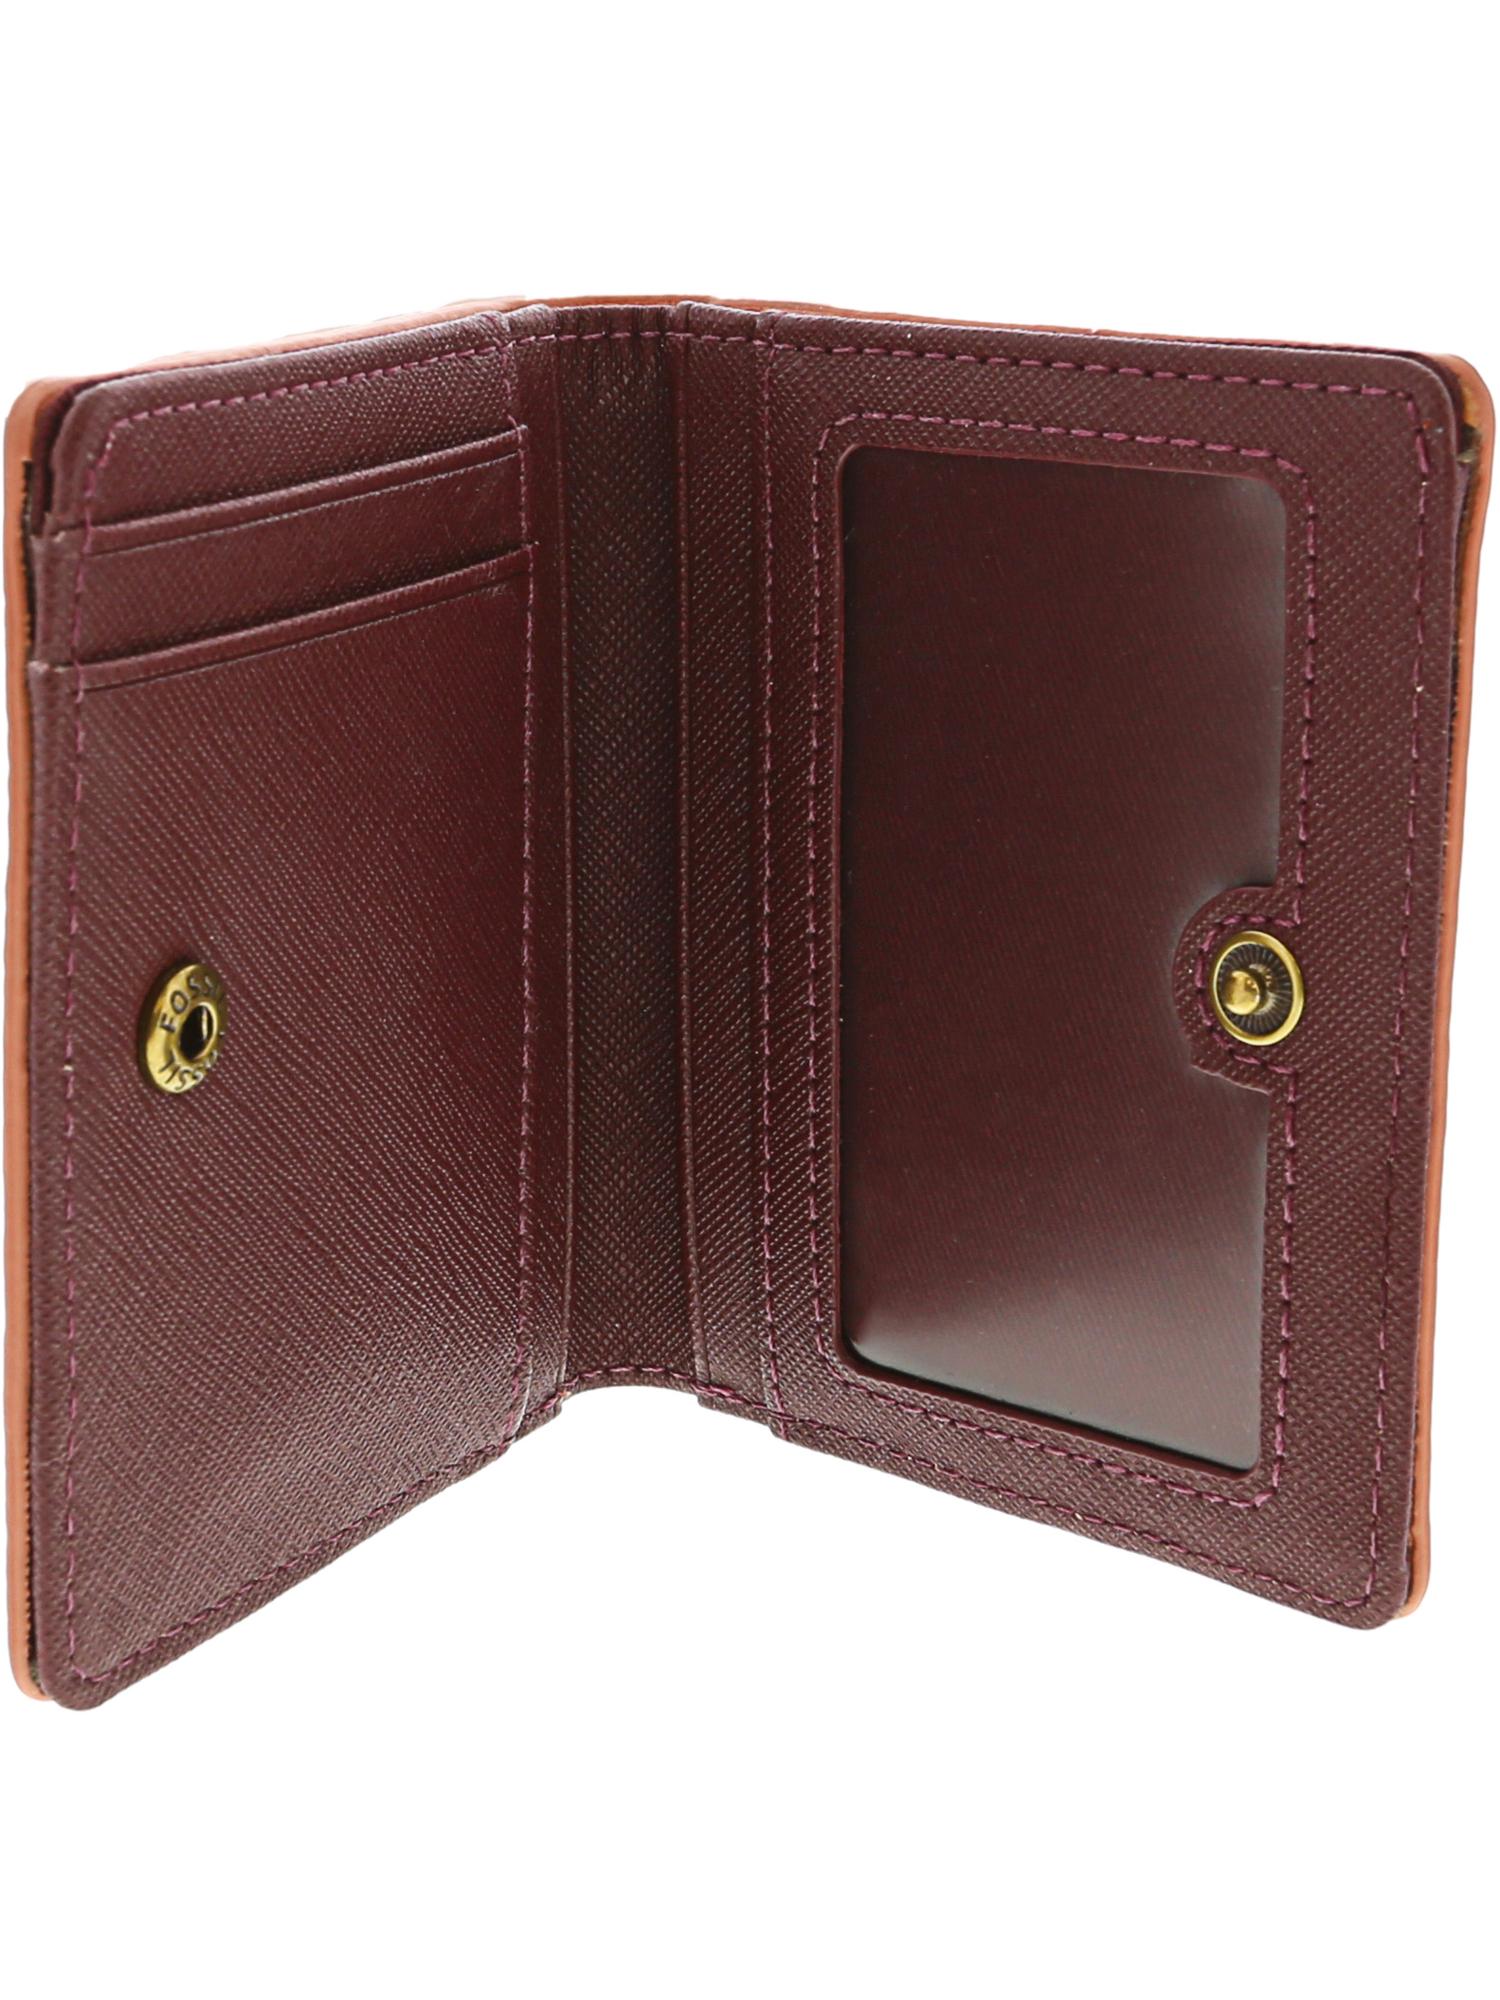 Fossil-Women-039-s-Emma-Rfid-Mini-Leather-Wallet thumbnail 16